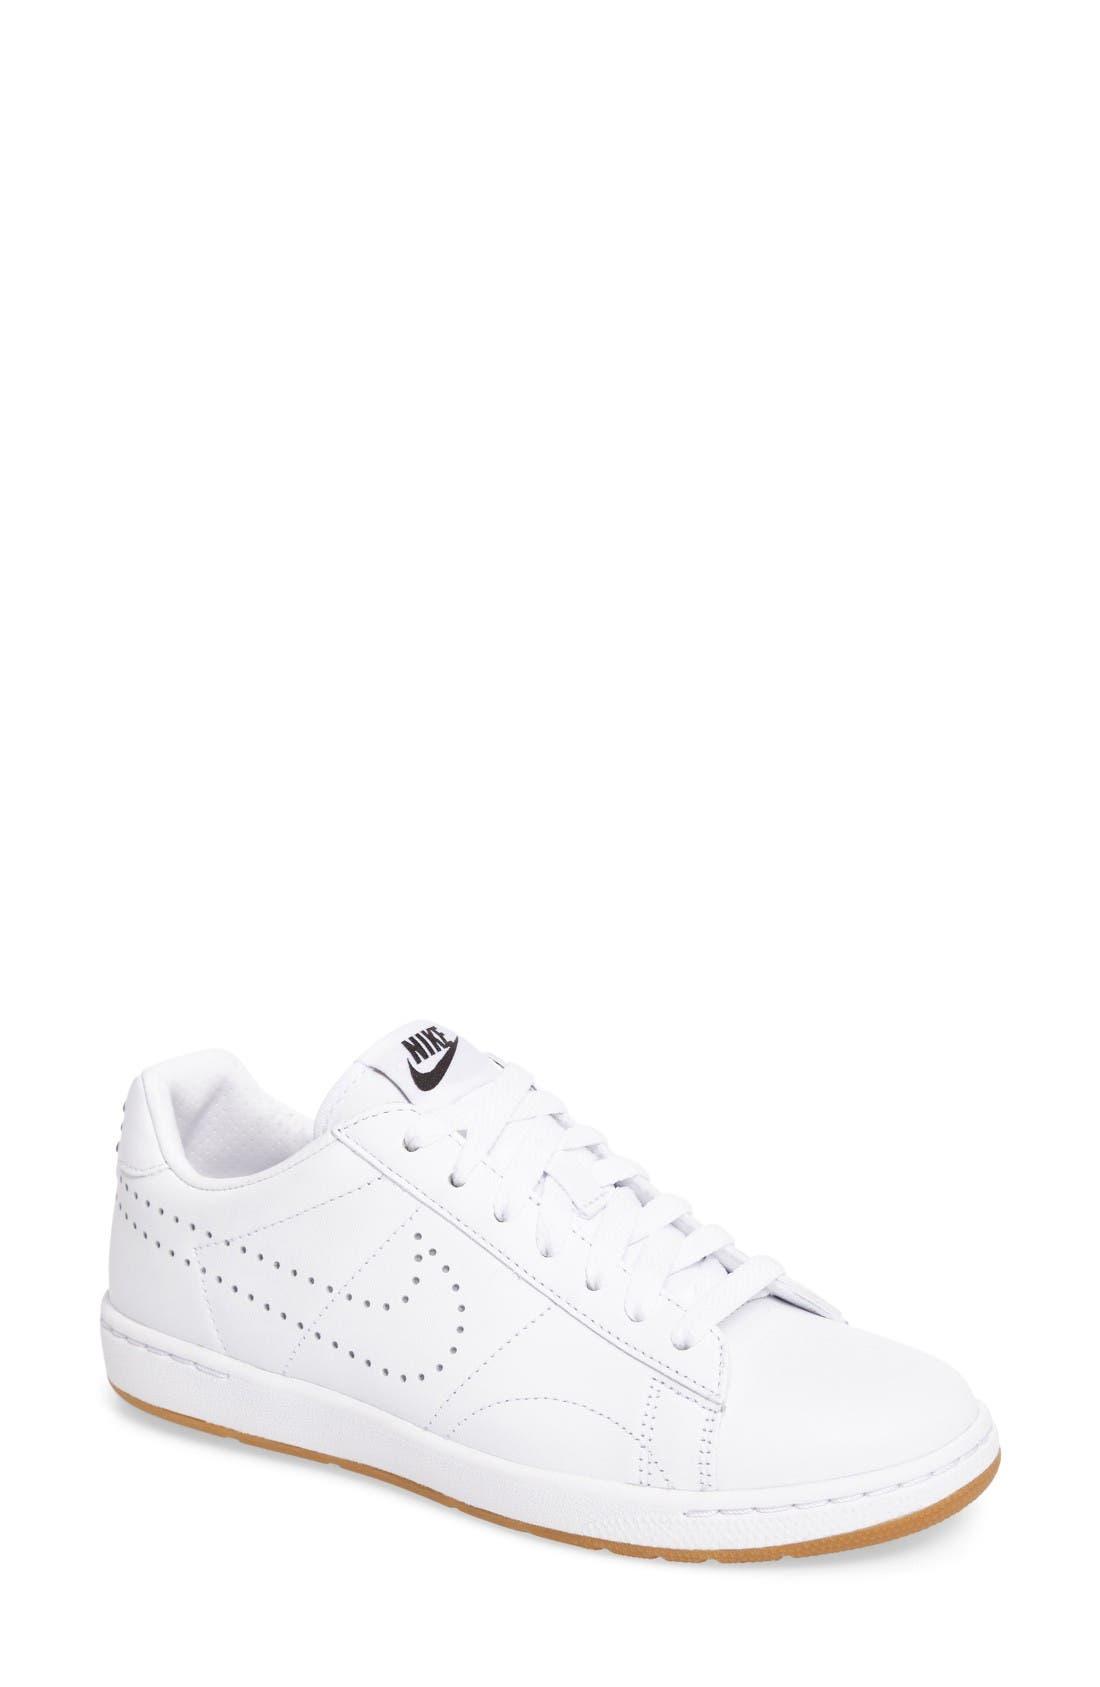 NIKE 'Classic Ultra' Leather Sneaker